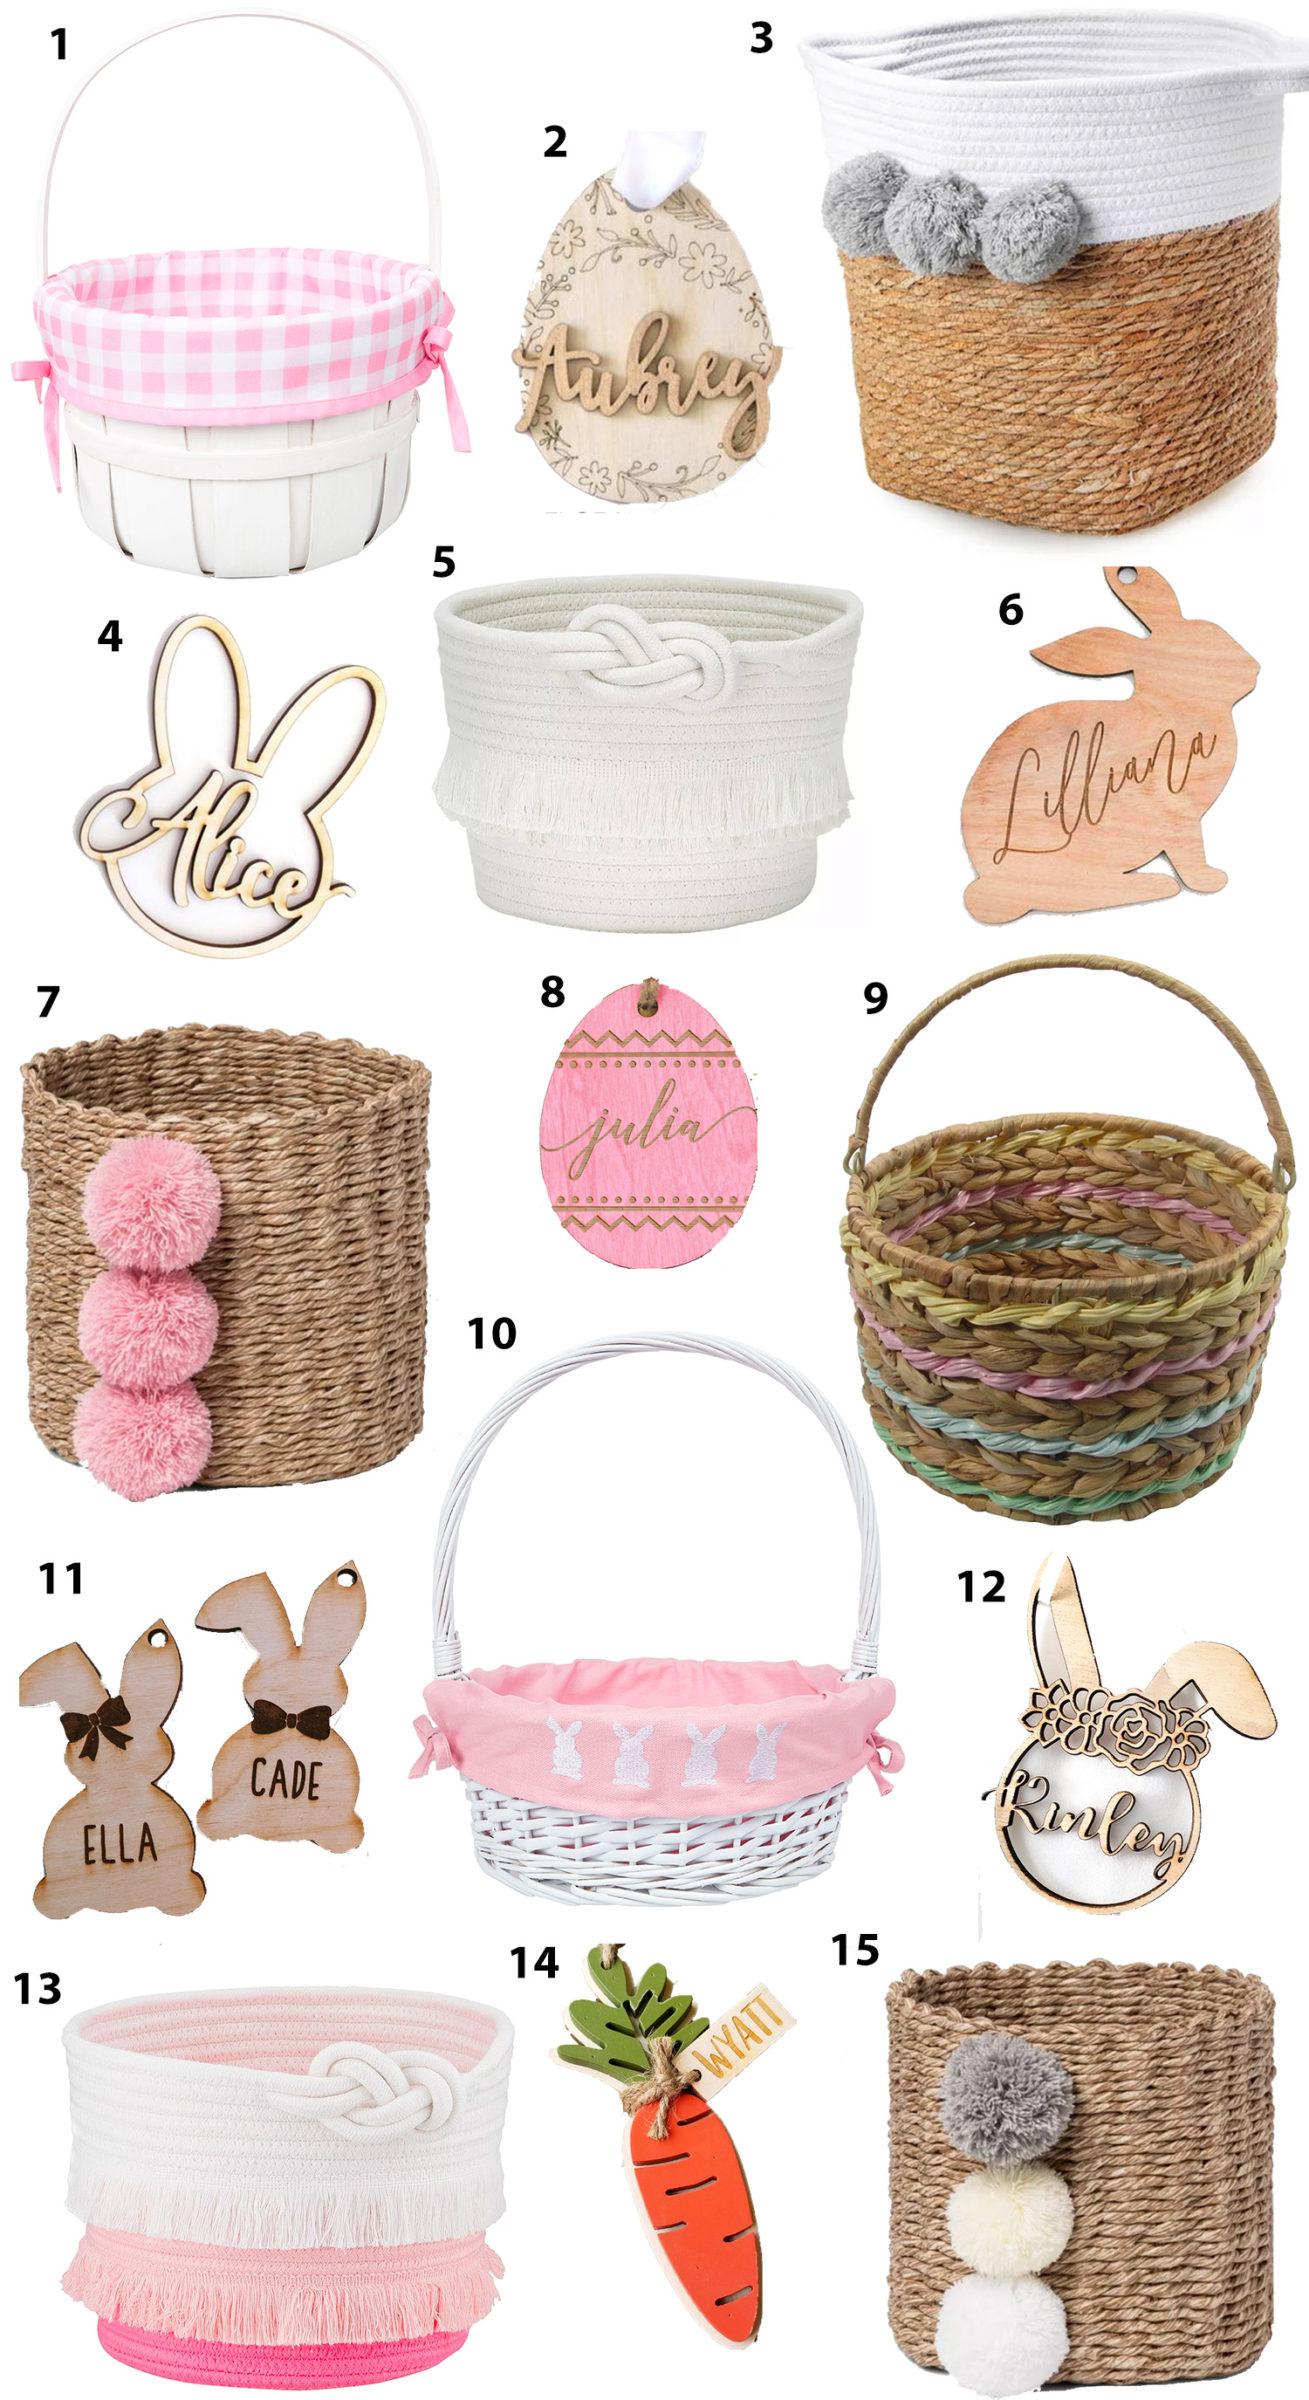 Cute Easter Baskets And Custom Easter Basket Name Tags For Kids Ashley Brooke Nicholas